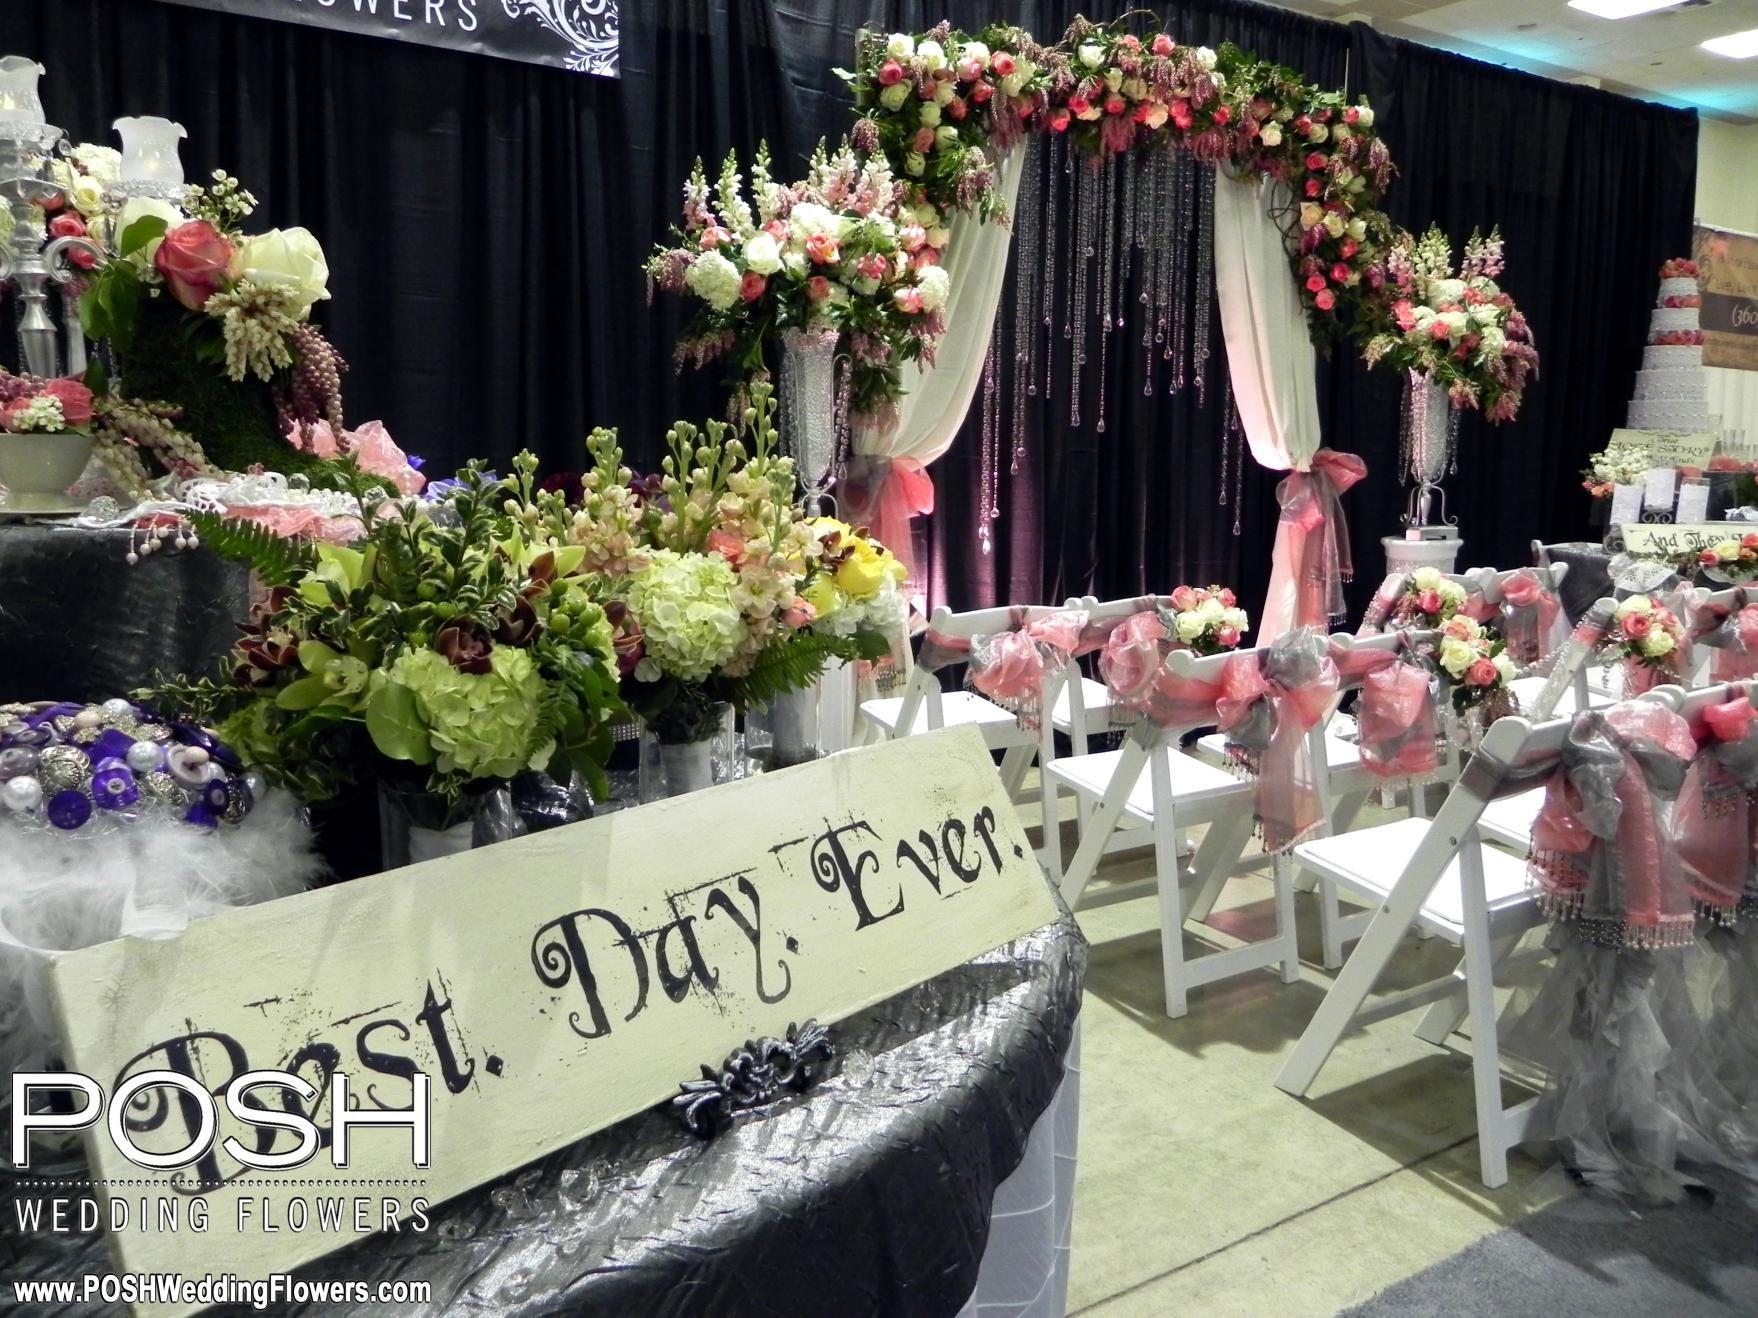 POSH booth at the Spring Tacoma Wedding Expo | Tacoma Wedding Expo